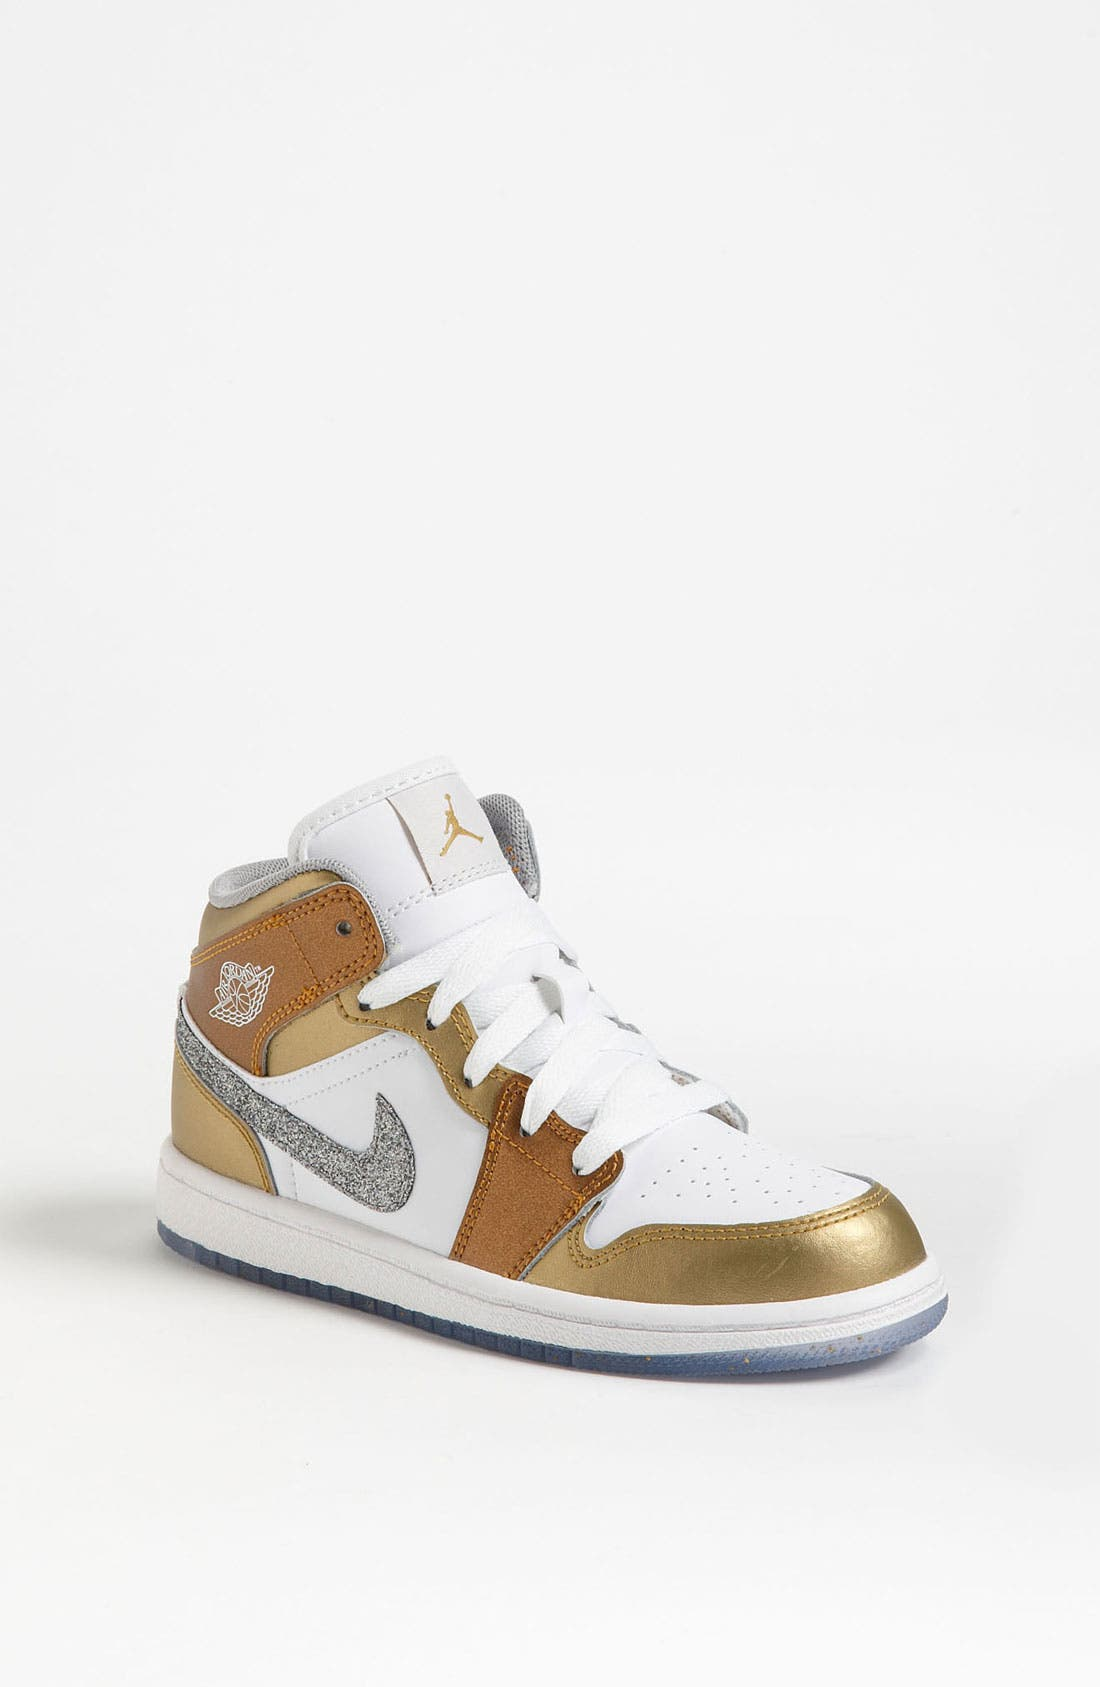 Alternate Image 1 Selected - Nike 'Jordan 1 Phat' Sneaker (Toddler & Little Kid)